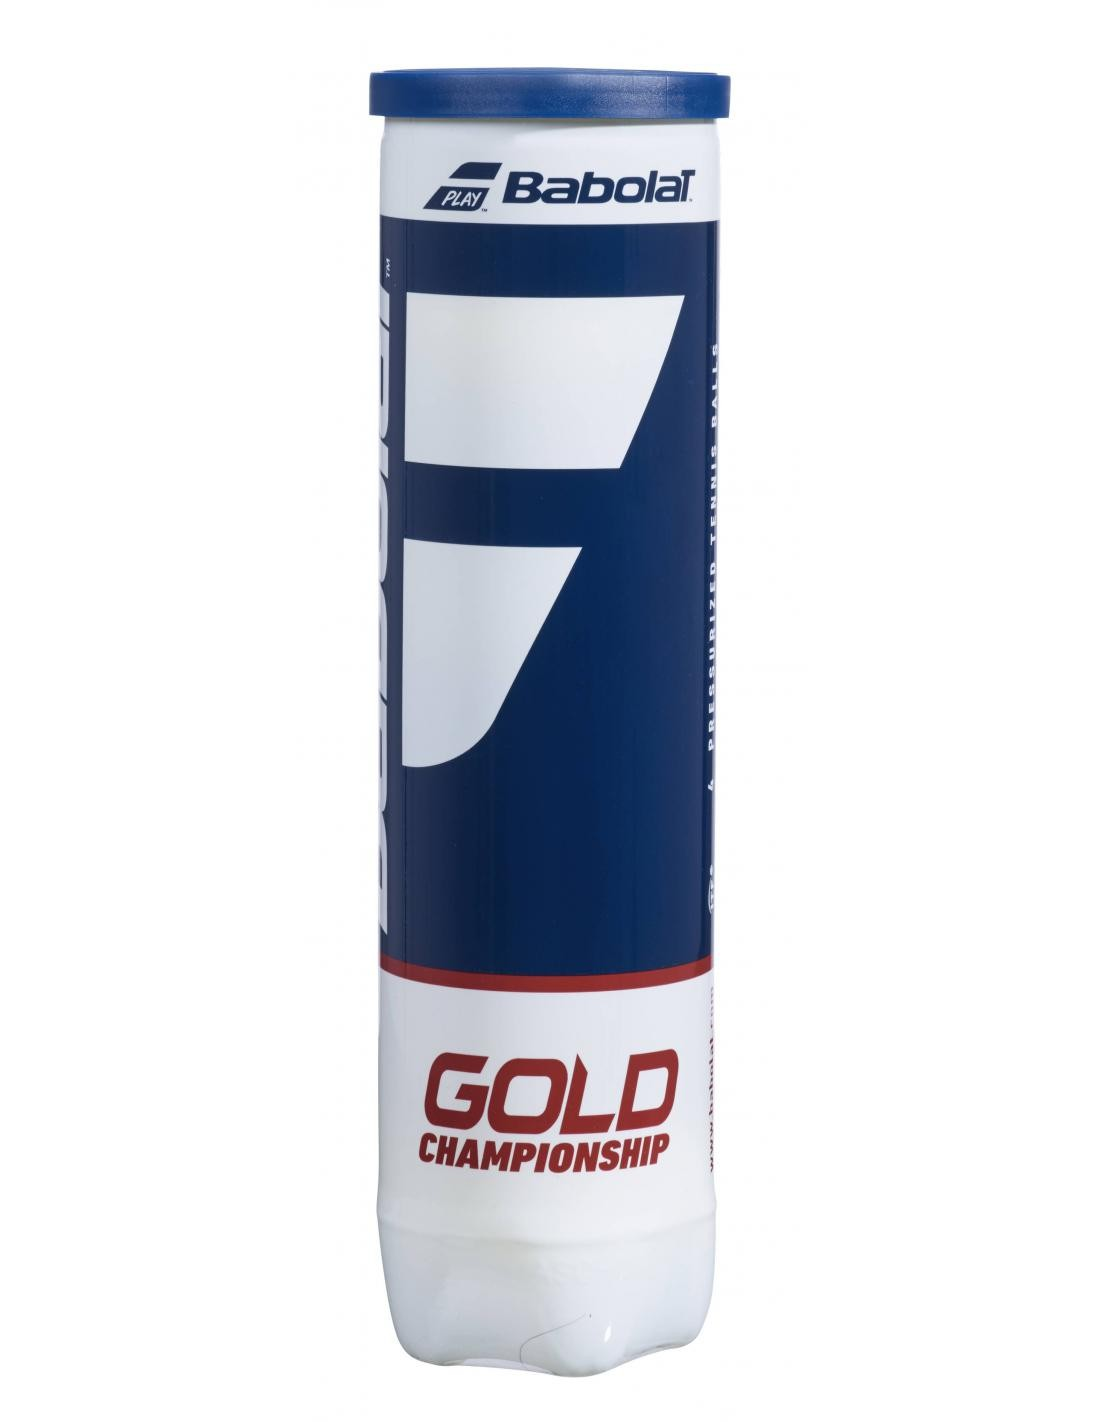 Piłki tenisowe Babolat Gold Championship - karton 18 x 4 szt